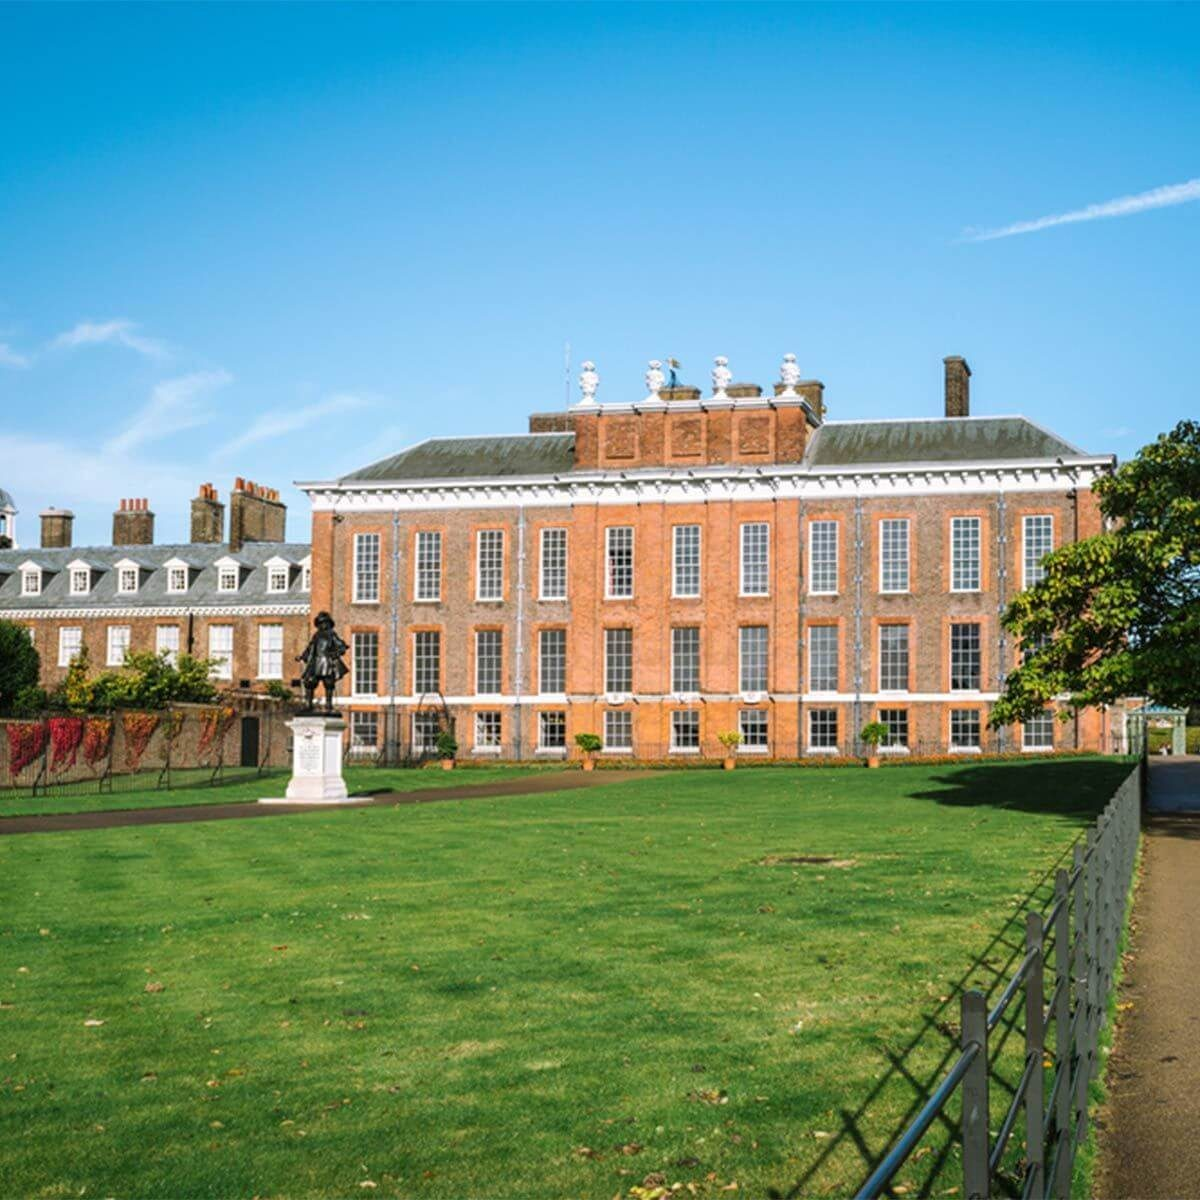 Royal Wren House